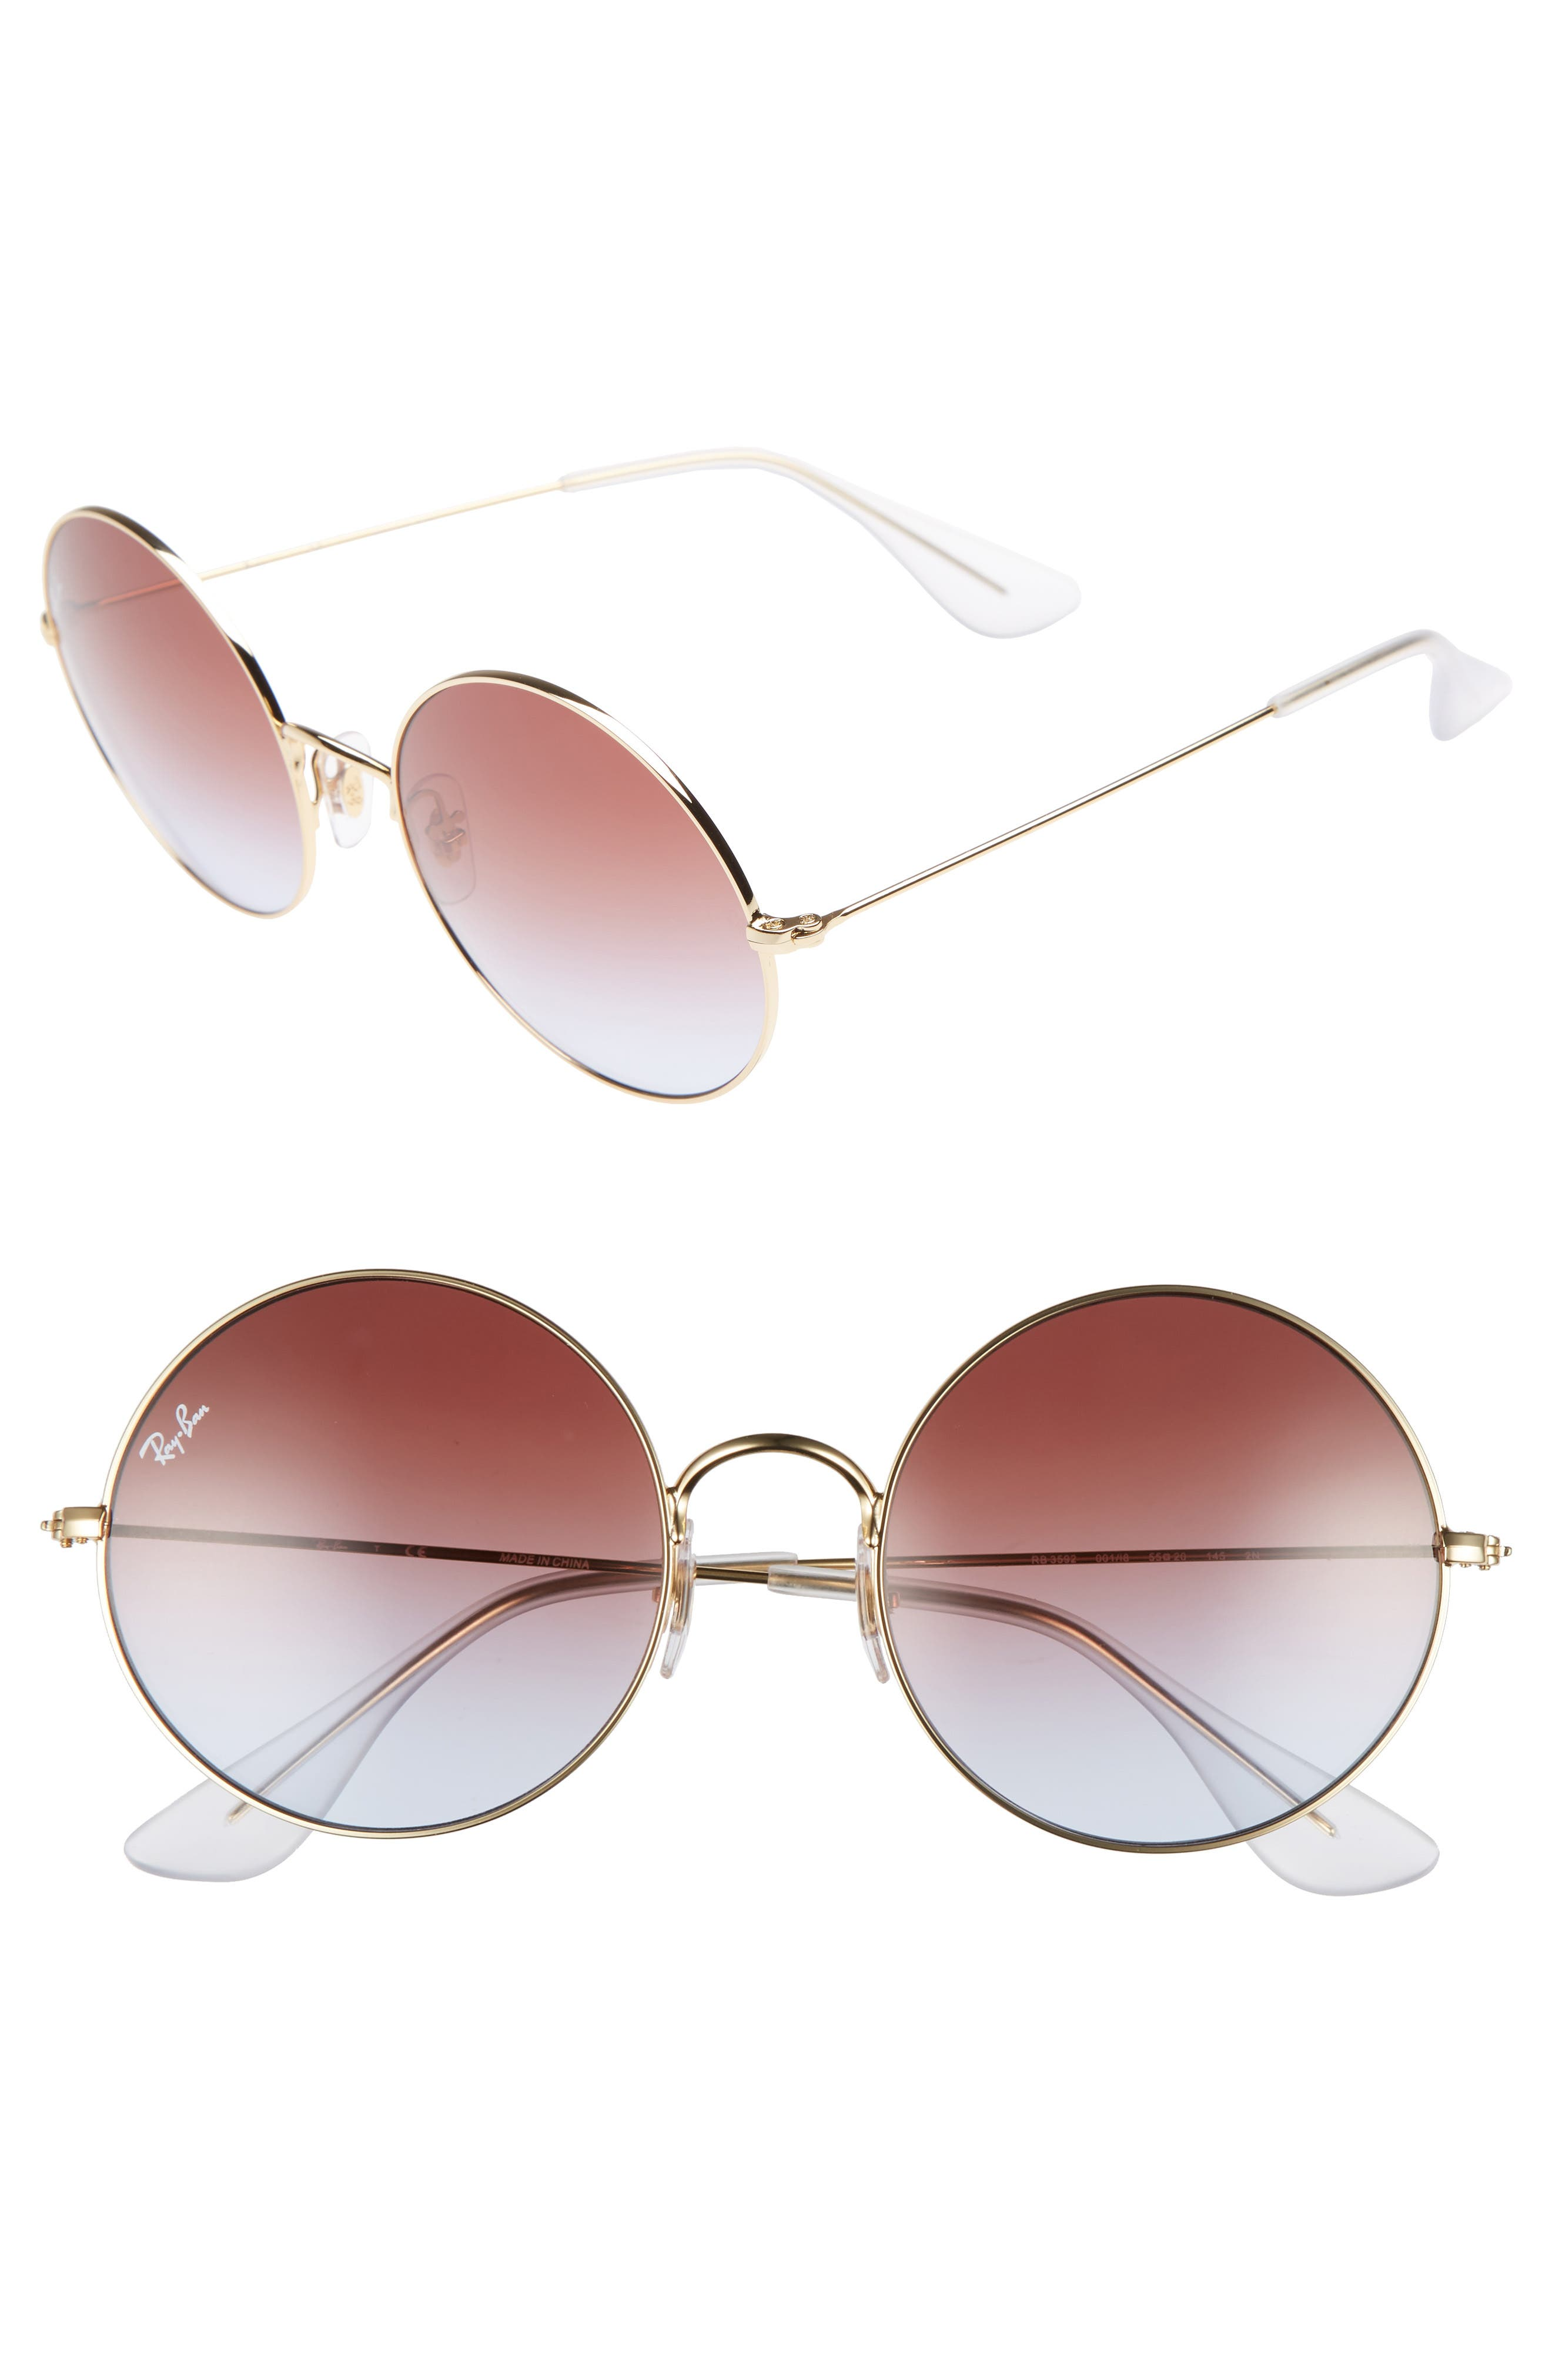 Main Image - Ray-Ban The Ja-Jo 54mm Round Sunglasses